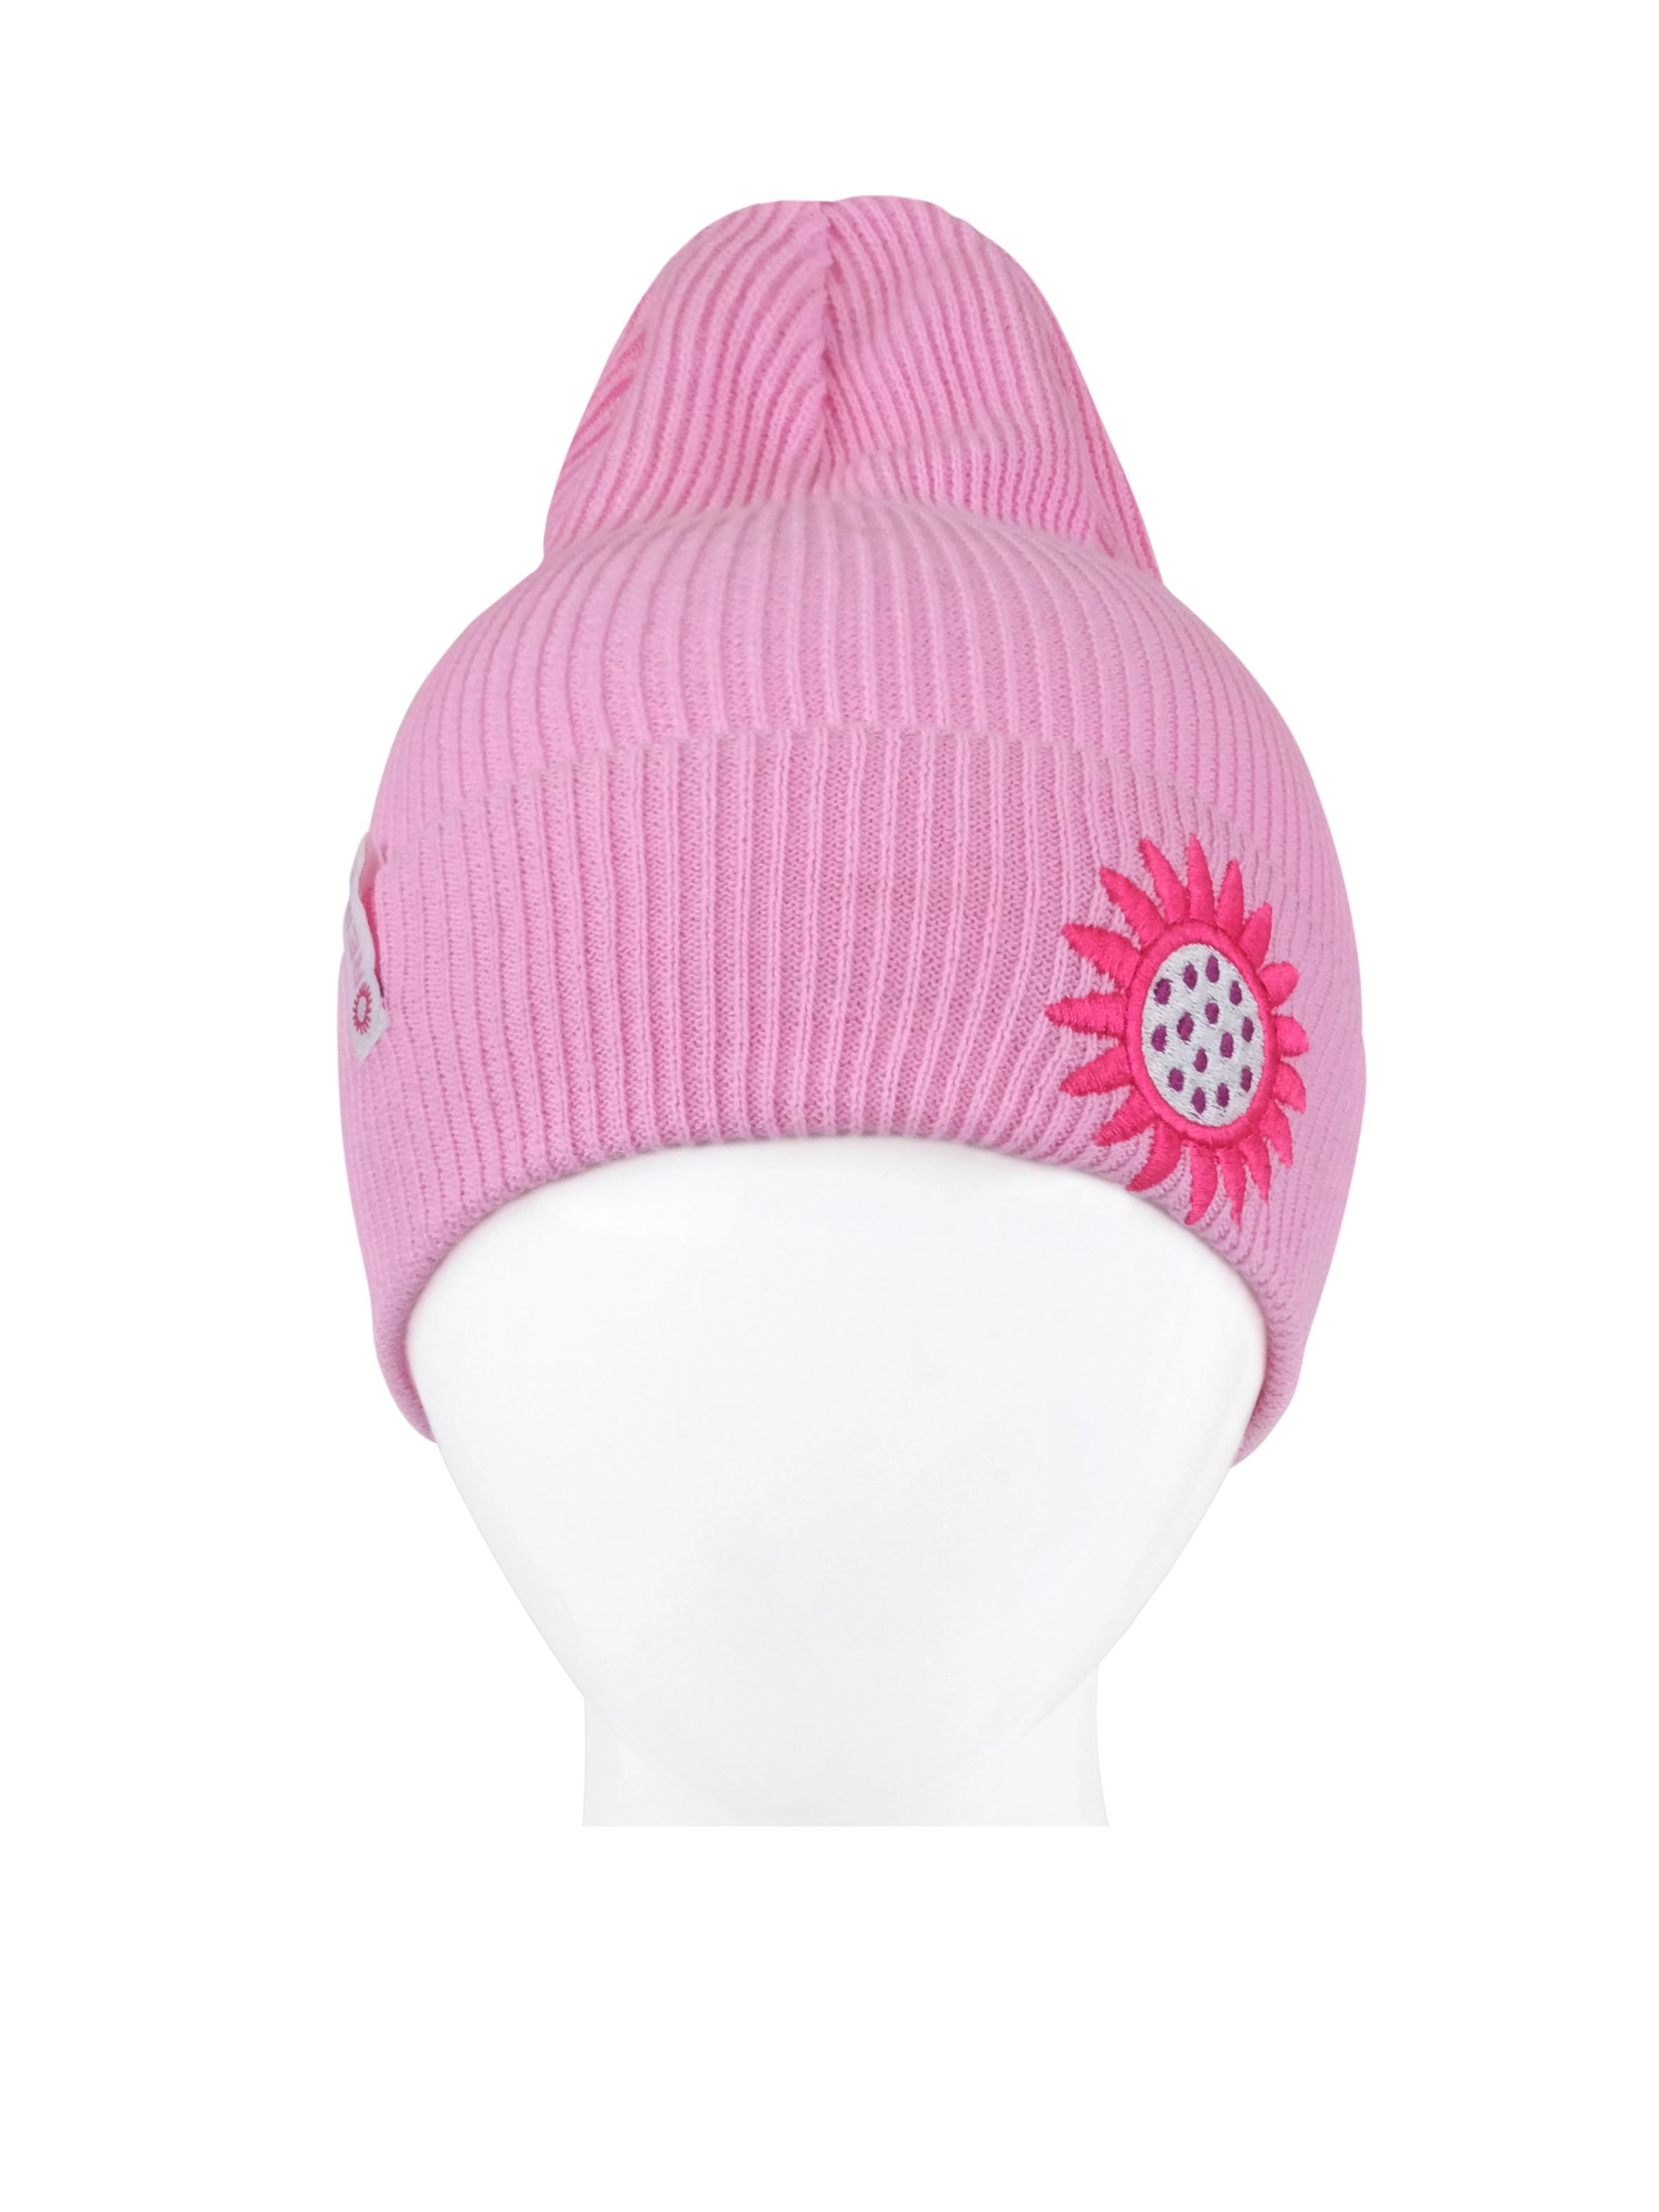 Купить Шапка для девочки Reike Сute bees pink, RKNSS20-CUB-YN-5 pink, р.54,